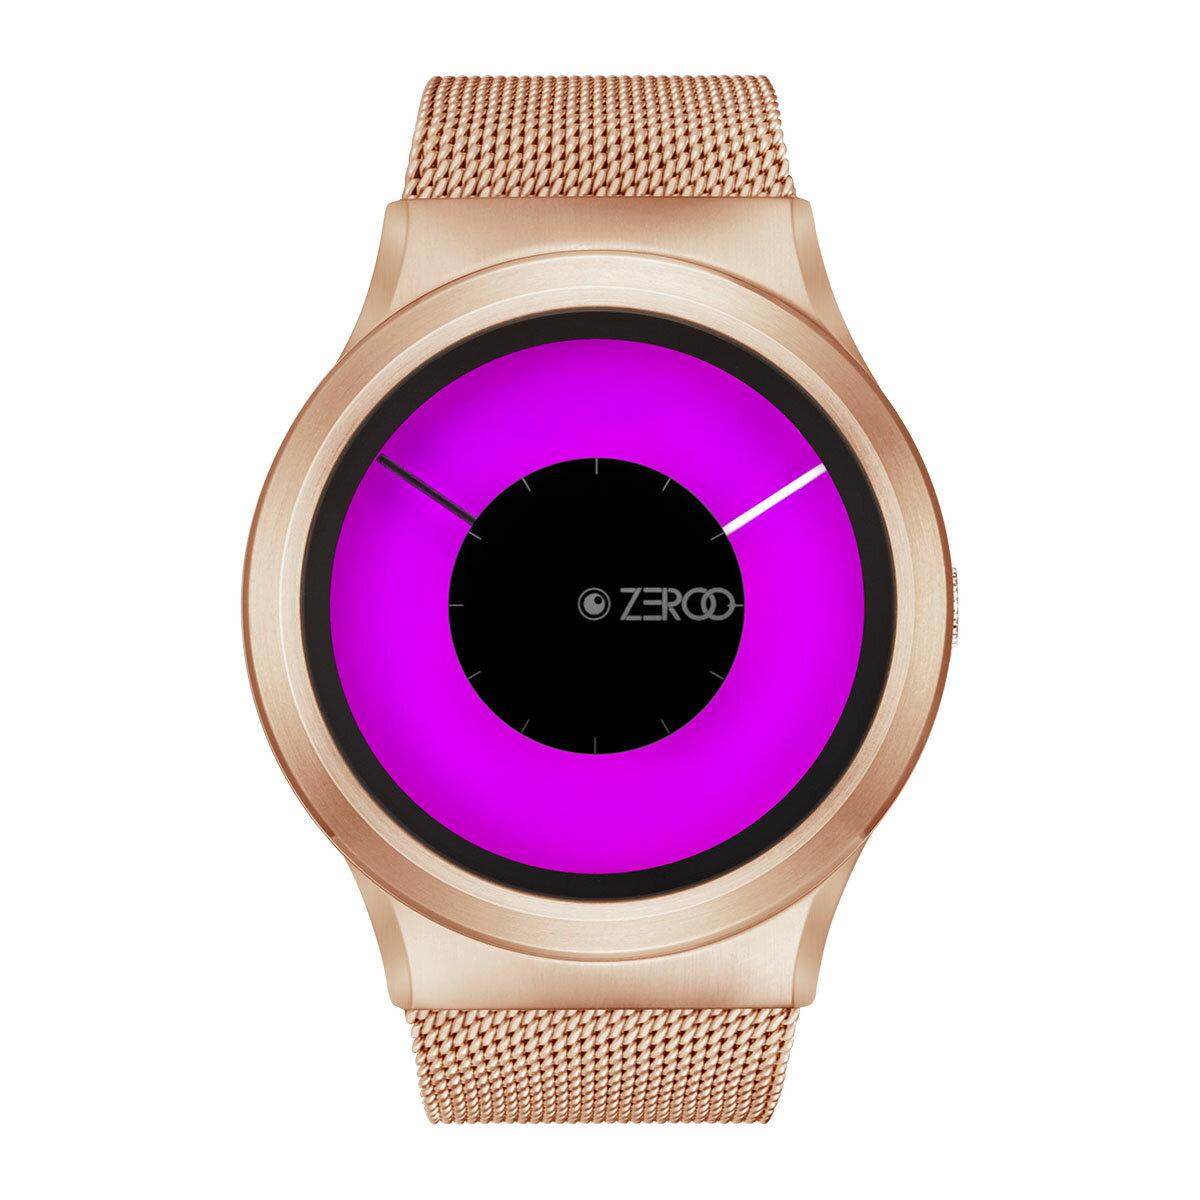 ZEROO MAGIA AURORA ゼロ 電池式クォーツ 腕時計 [W11025B05SM05] ピンク デザインウォッチ ペア用 メンズ レディース ユニセックス おしゃれ時計 デザイナーズ